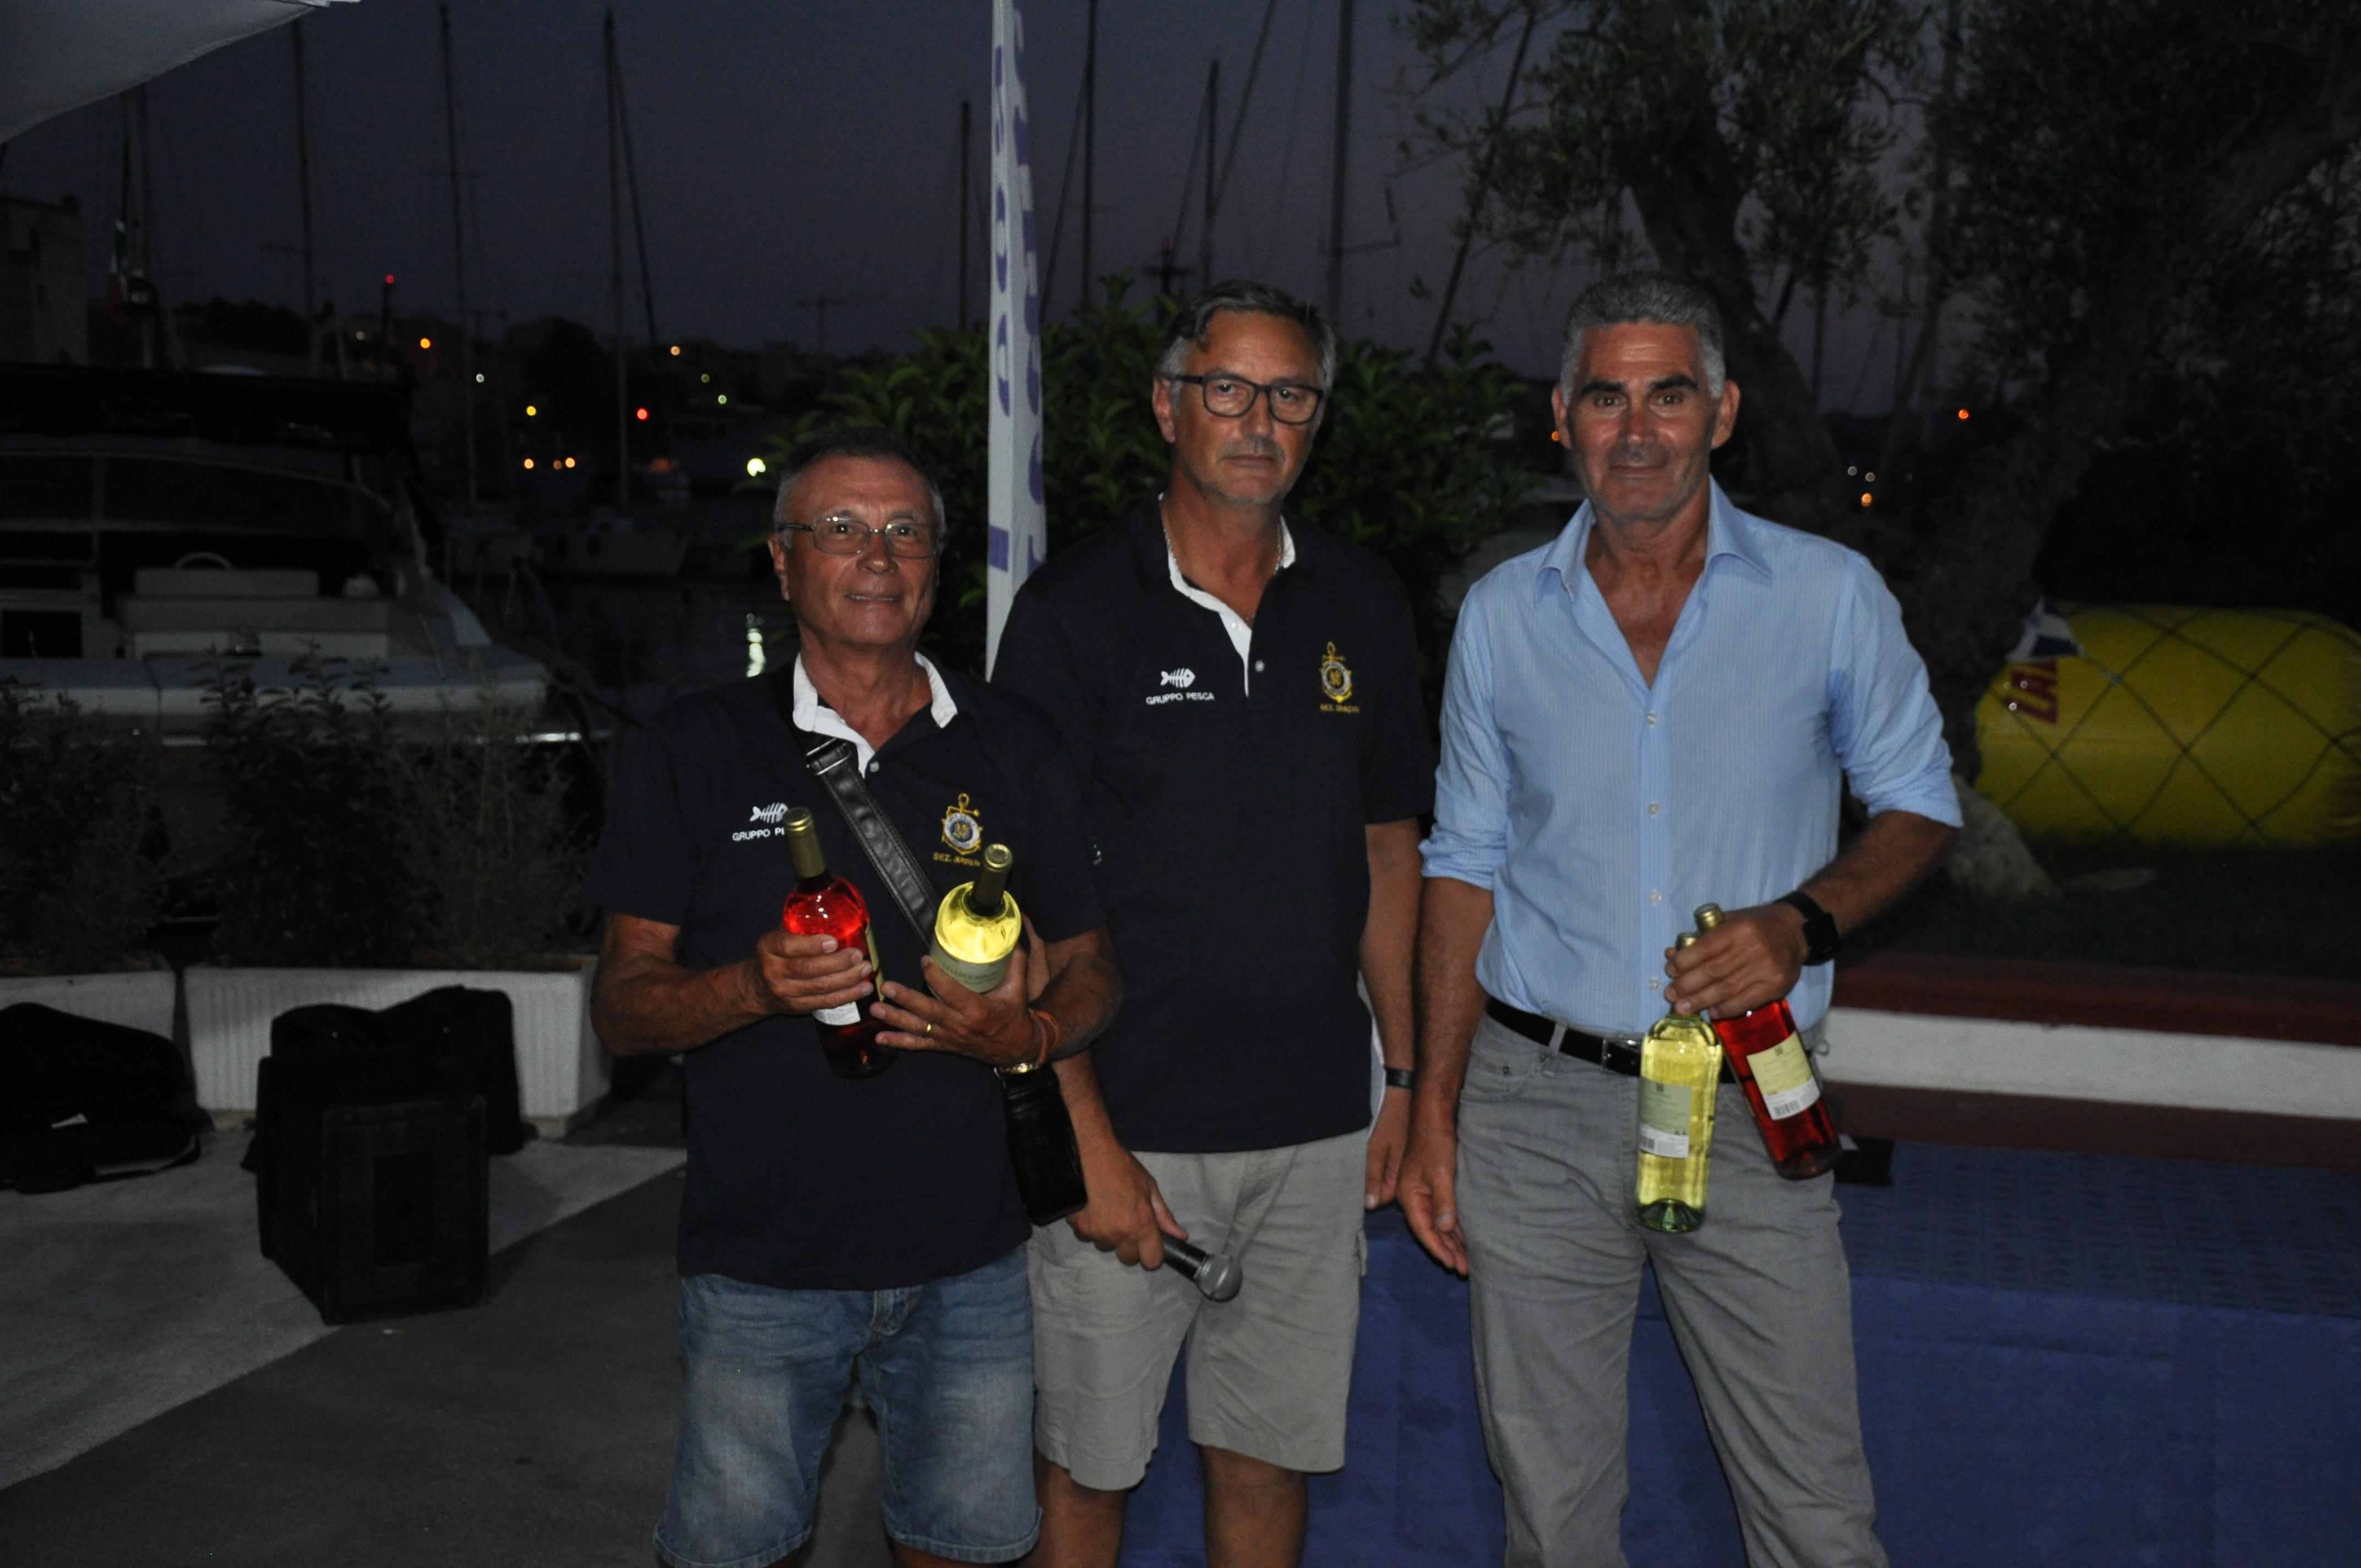 premiazione drifting al tonno 2018 (21)